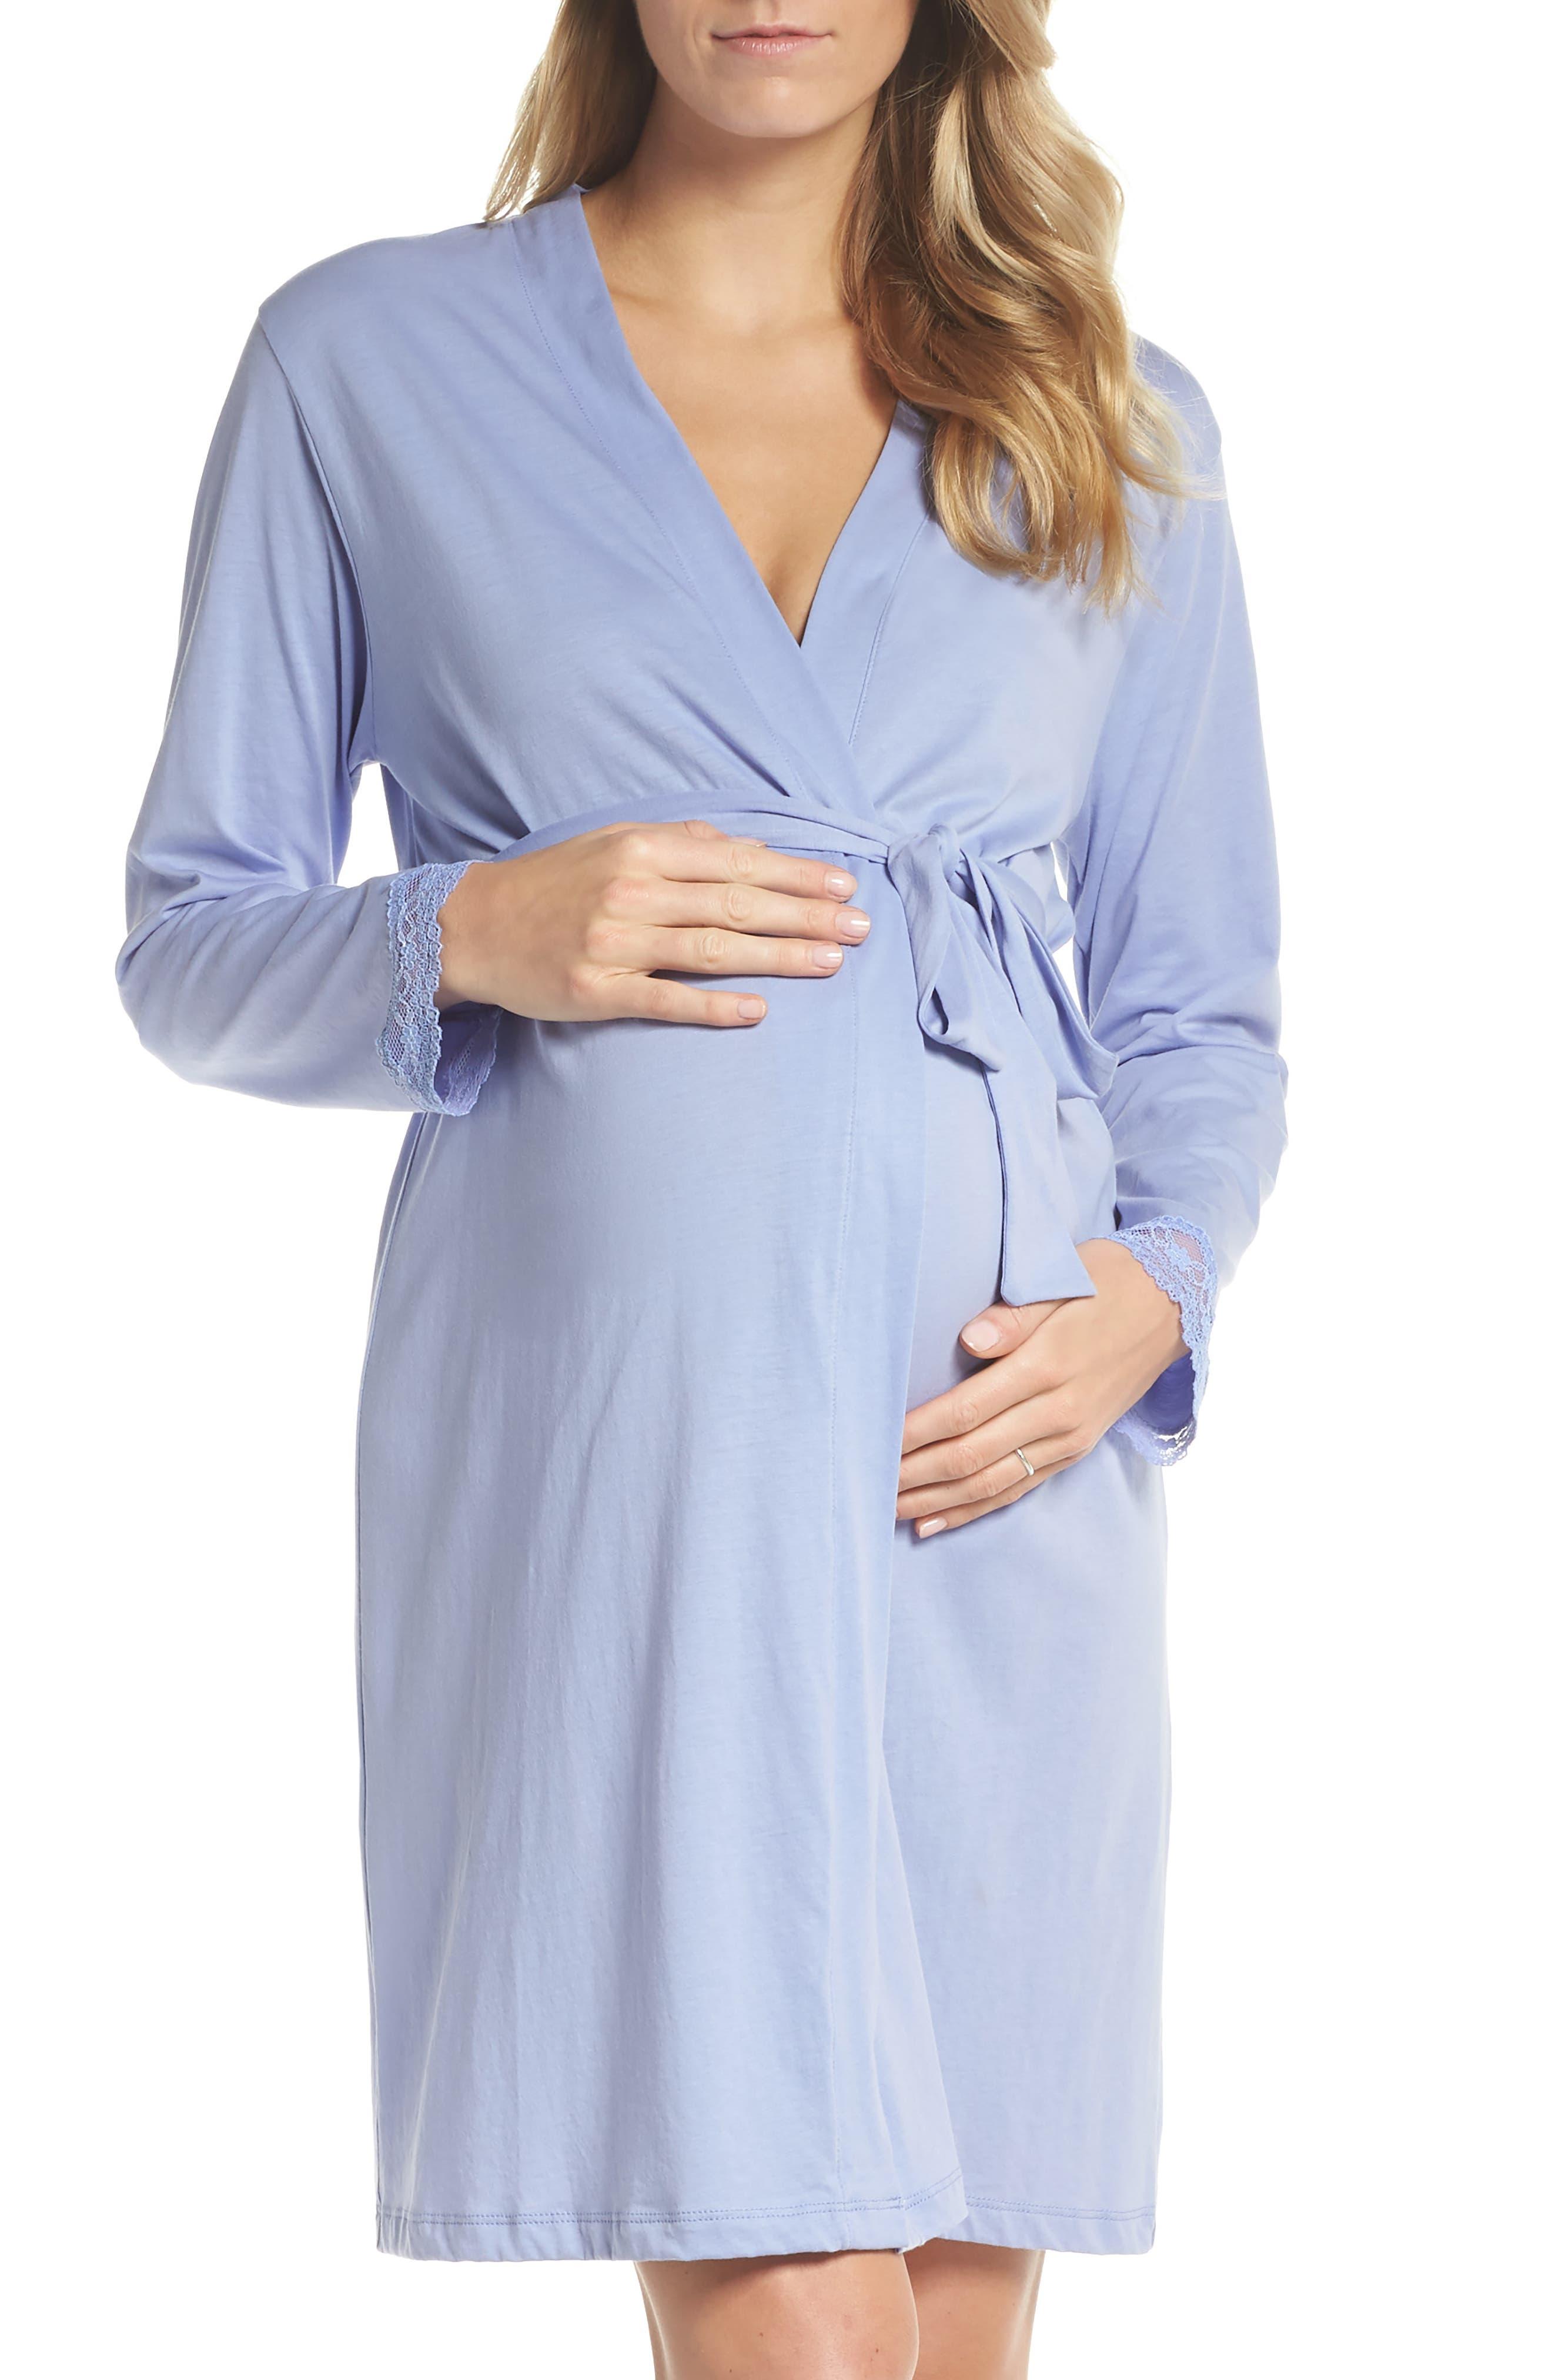 Alternate Image 1 Selected - Belabumbum Violette Maternity/Nursing Robe